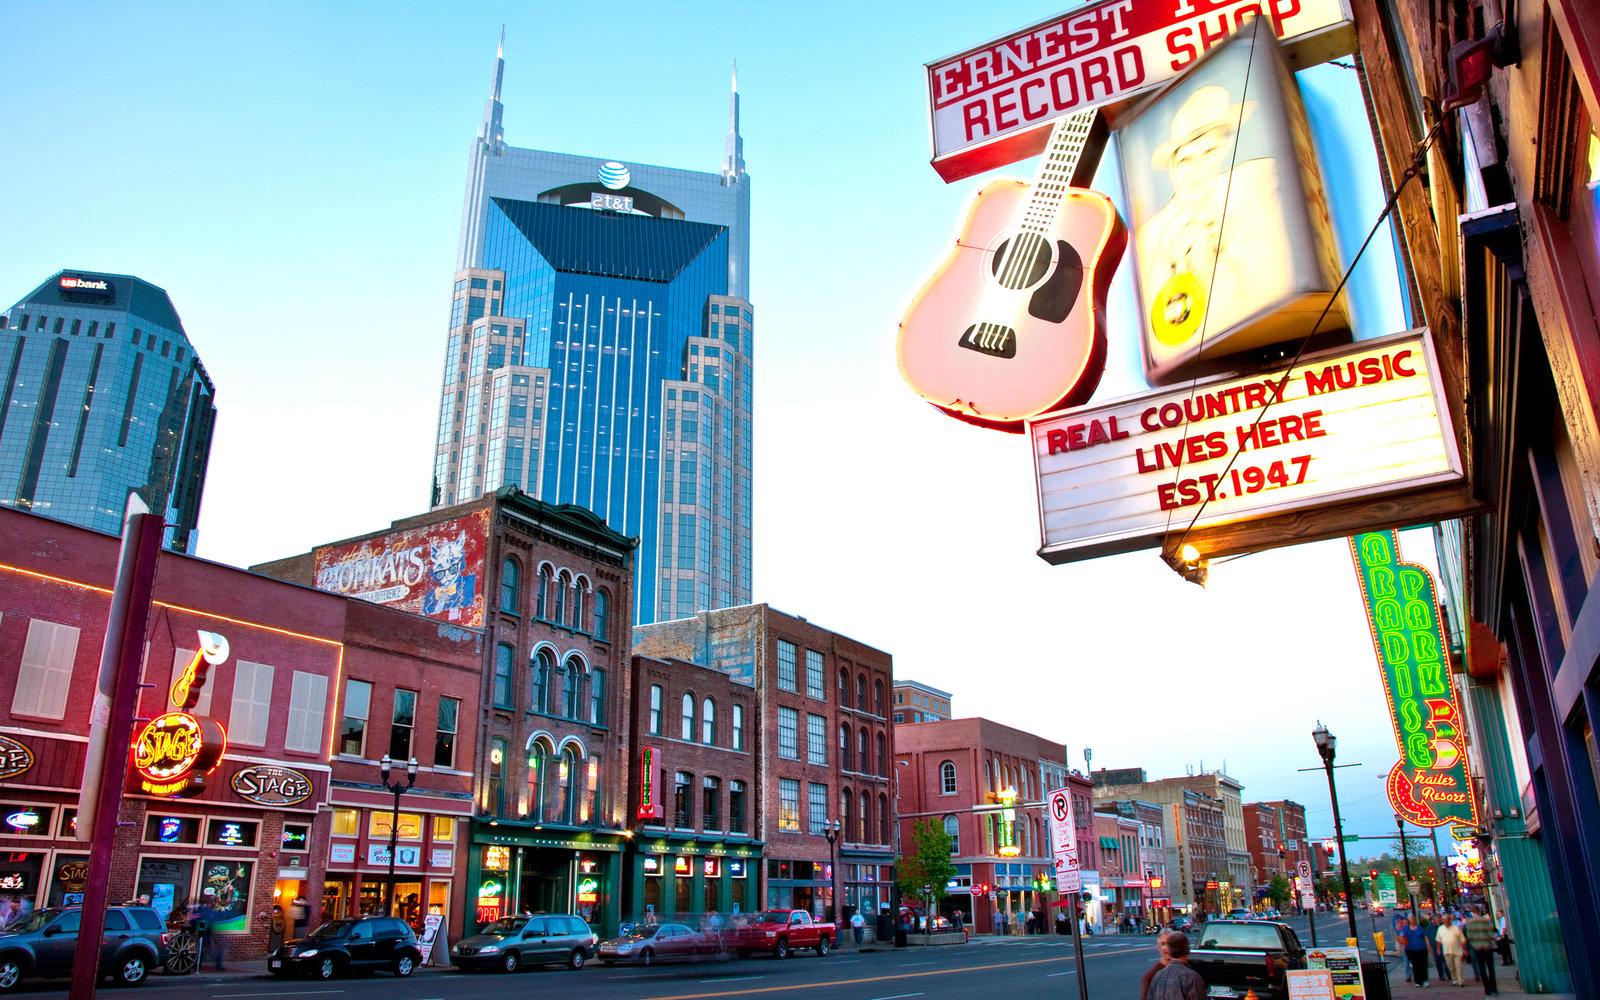 Incentive Travel Nashville, Tennessee